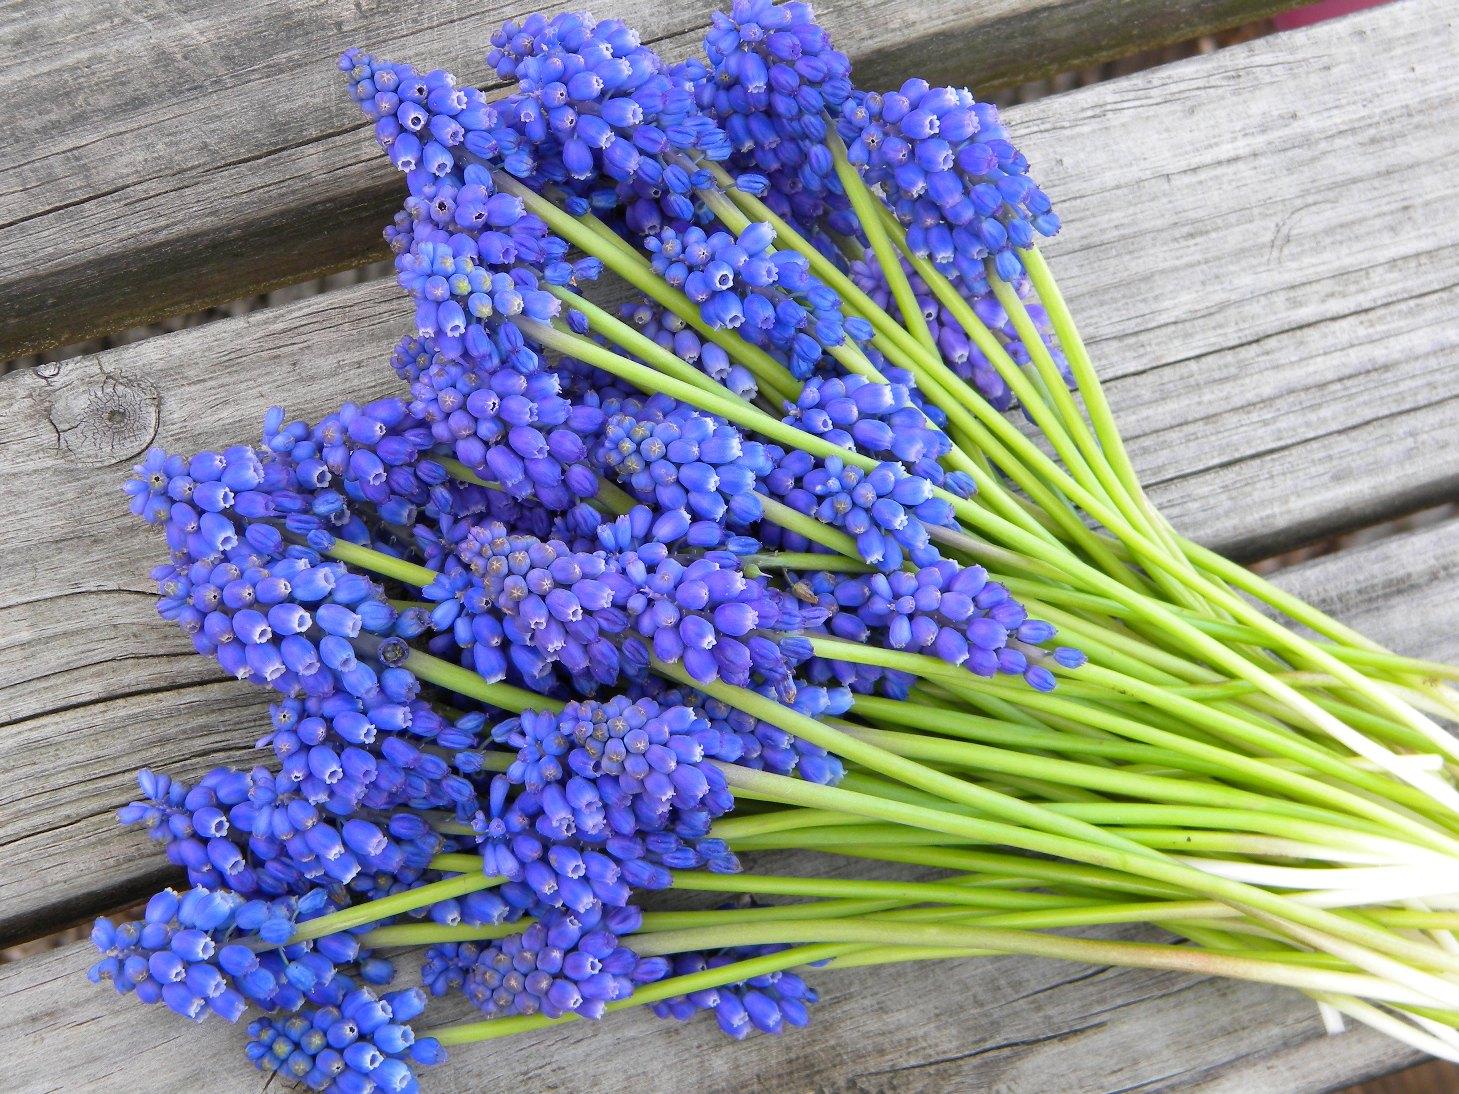 Wedding flowers from springwell beautiful blue anemone and muscari wedding flowers from springwell izmirmasajfo